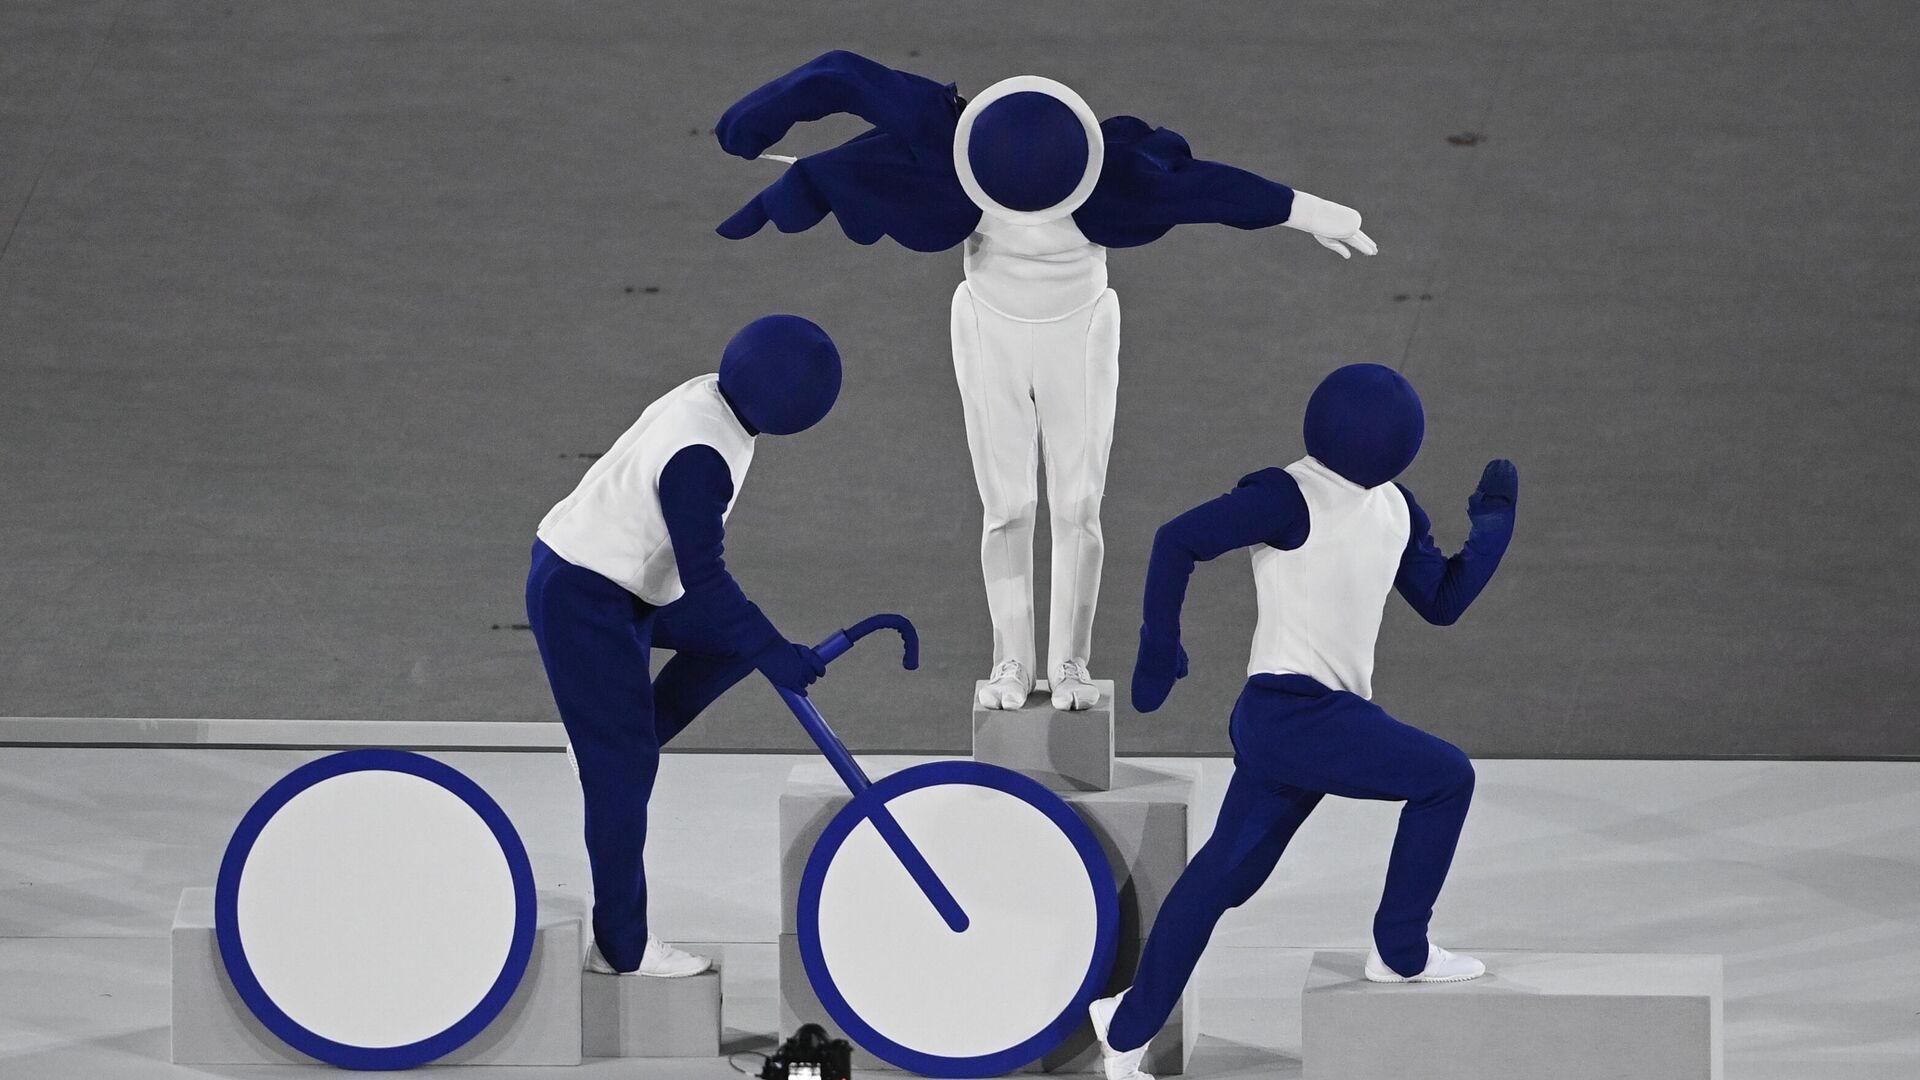 Церемония открытия XXXII летних Олимпийских игр - РИА Новости, 1920, 26.07.2021